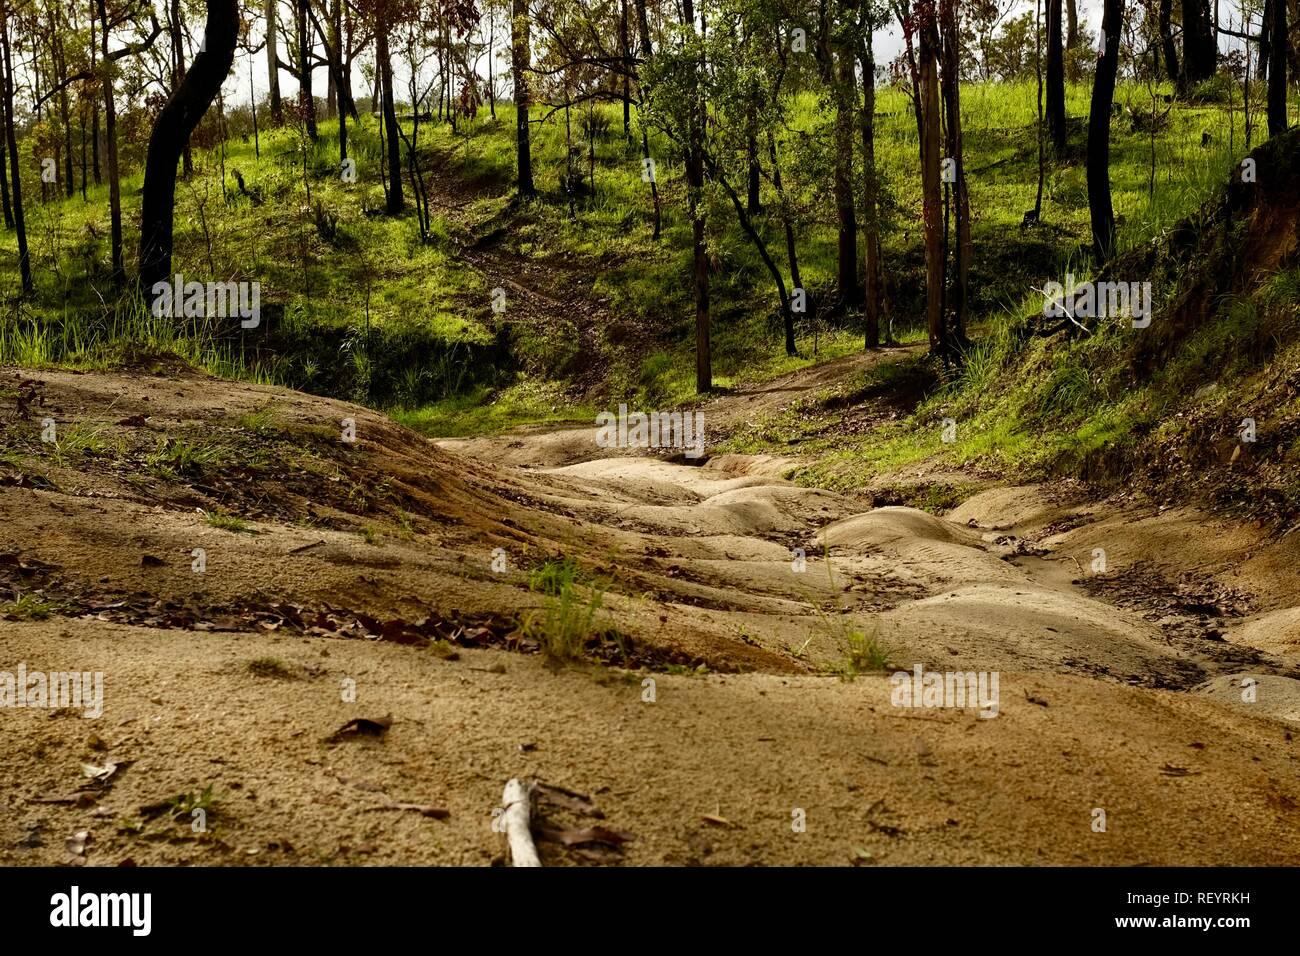 A dirt fire access road in Mia Mia State Forest, Queensland, Australia Stock Photo